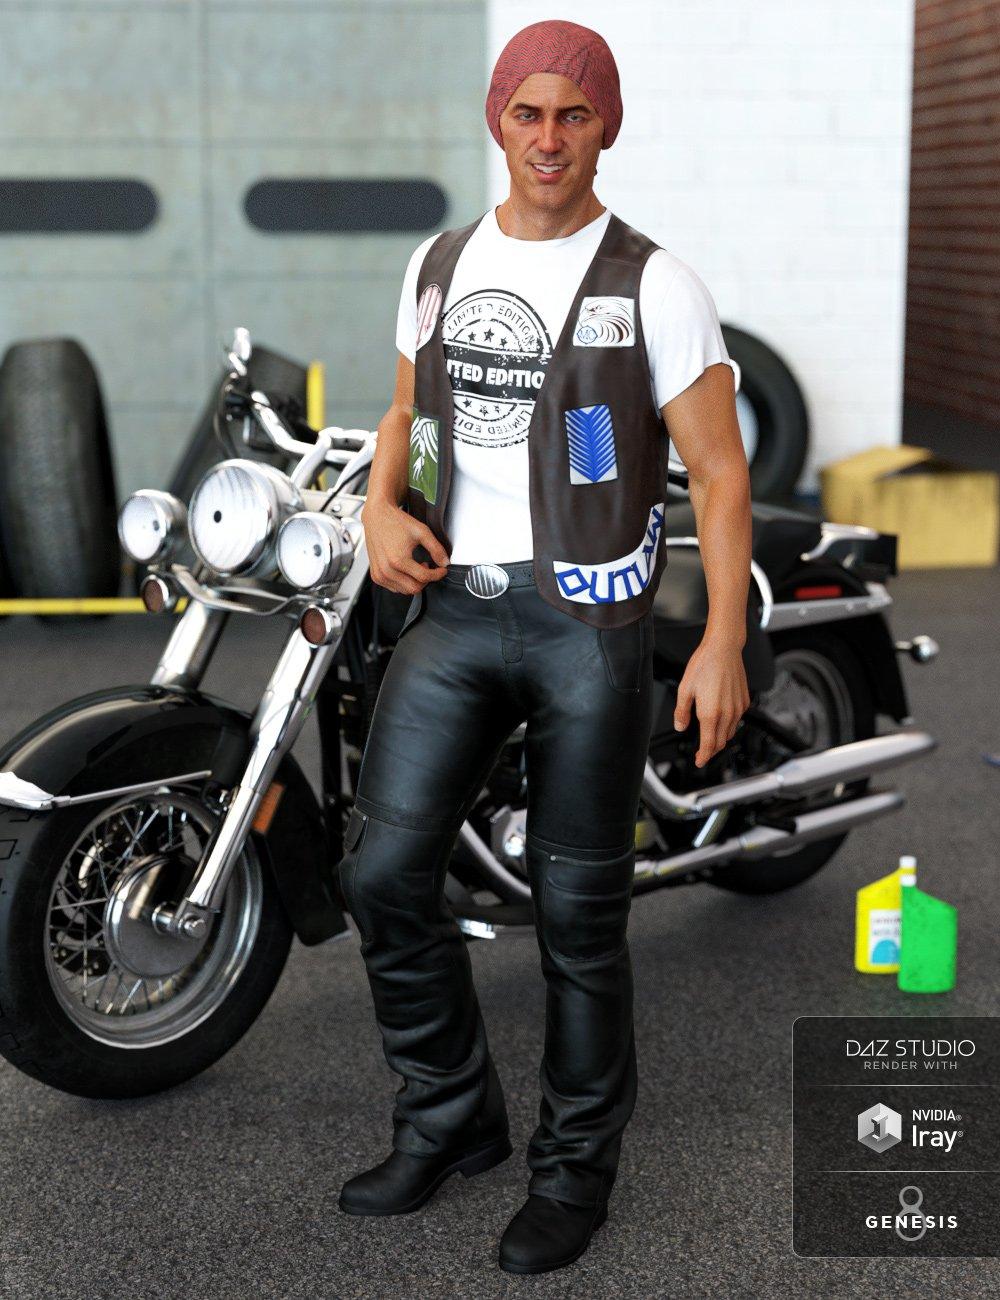 dForce Biker Outfit for Genesis 8 Male(s) by: Nikisatez, 3D Models by Daz 3D